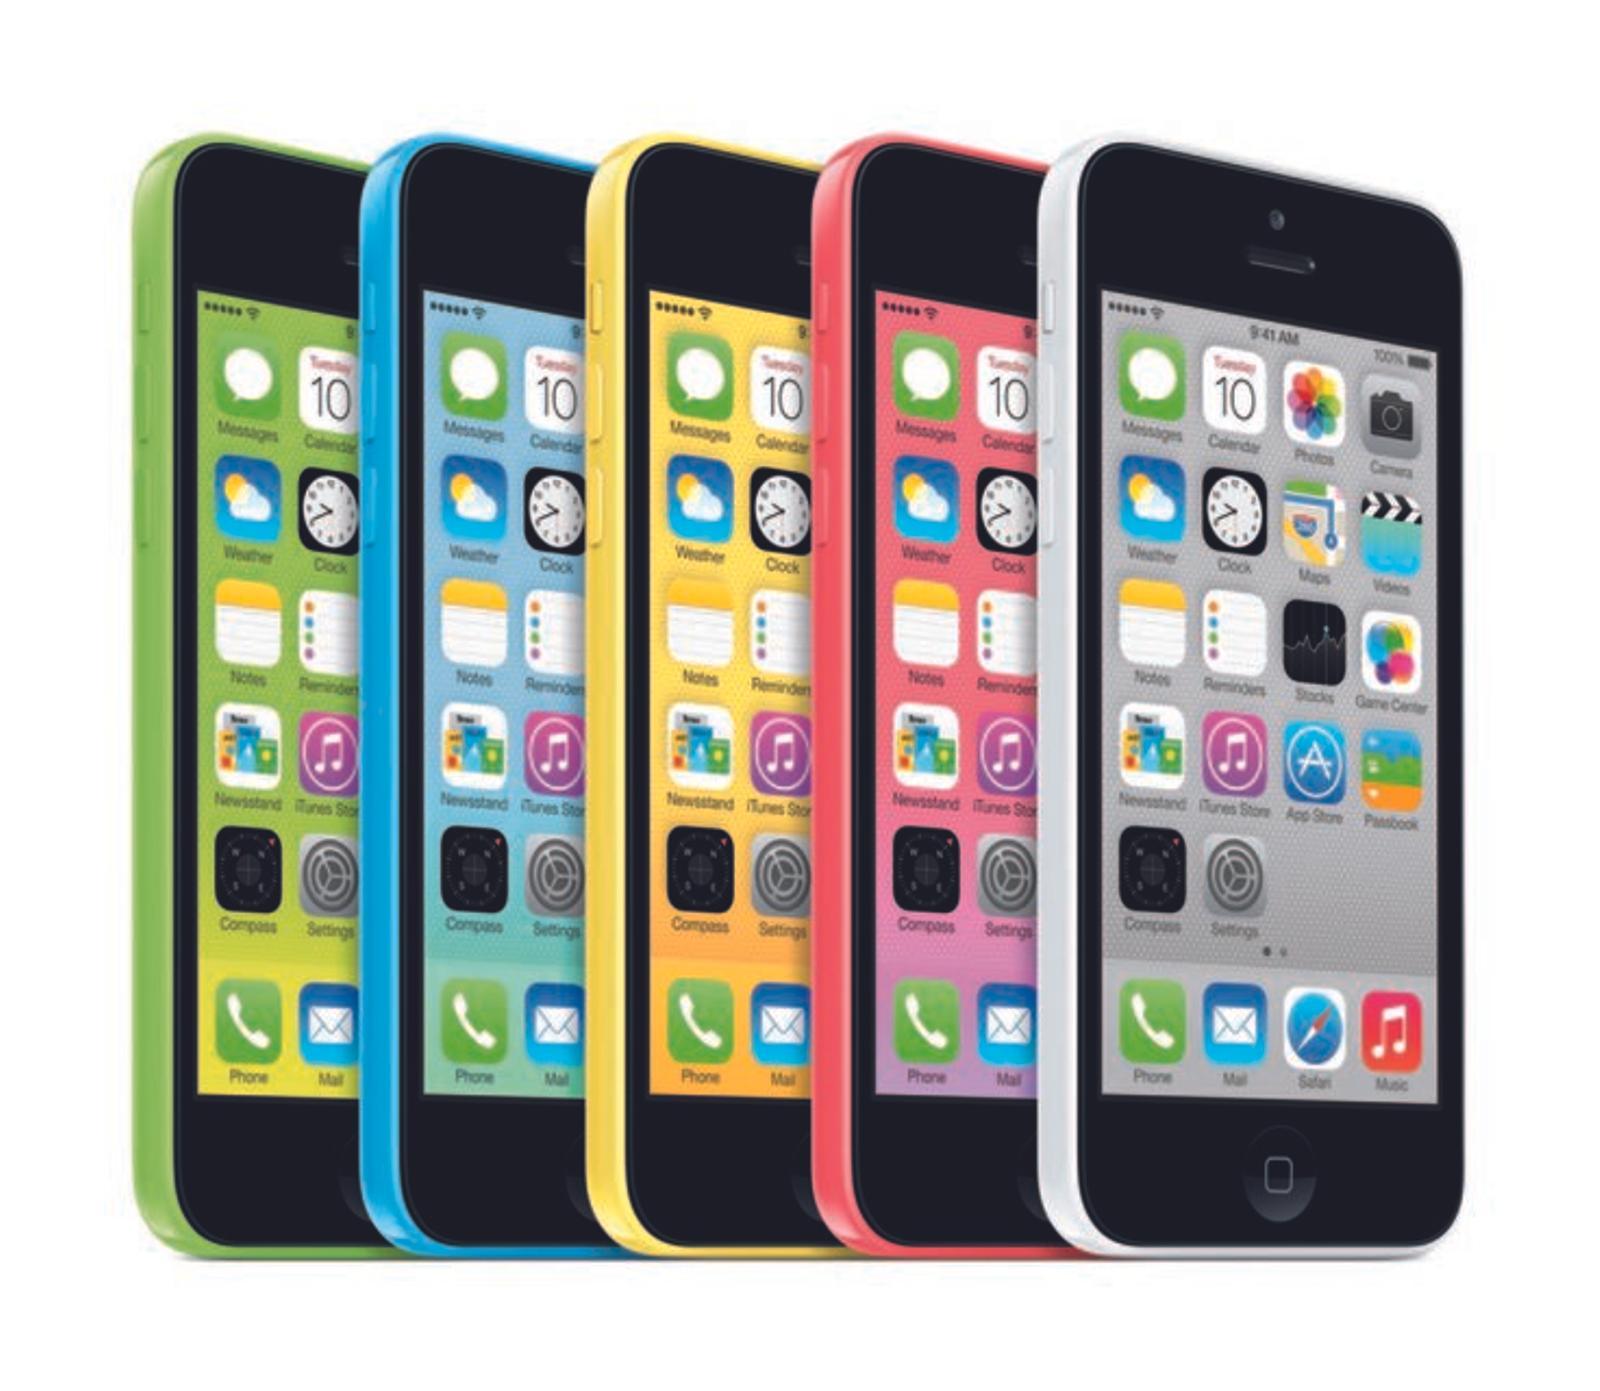 New Apple iPhones